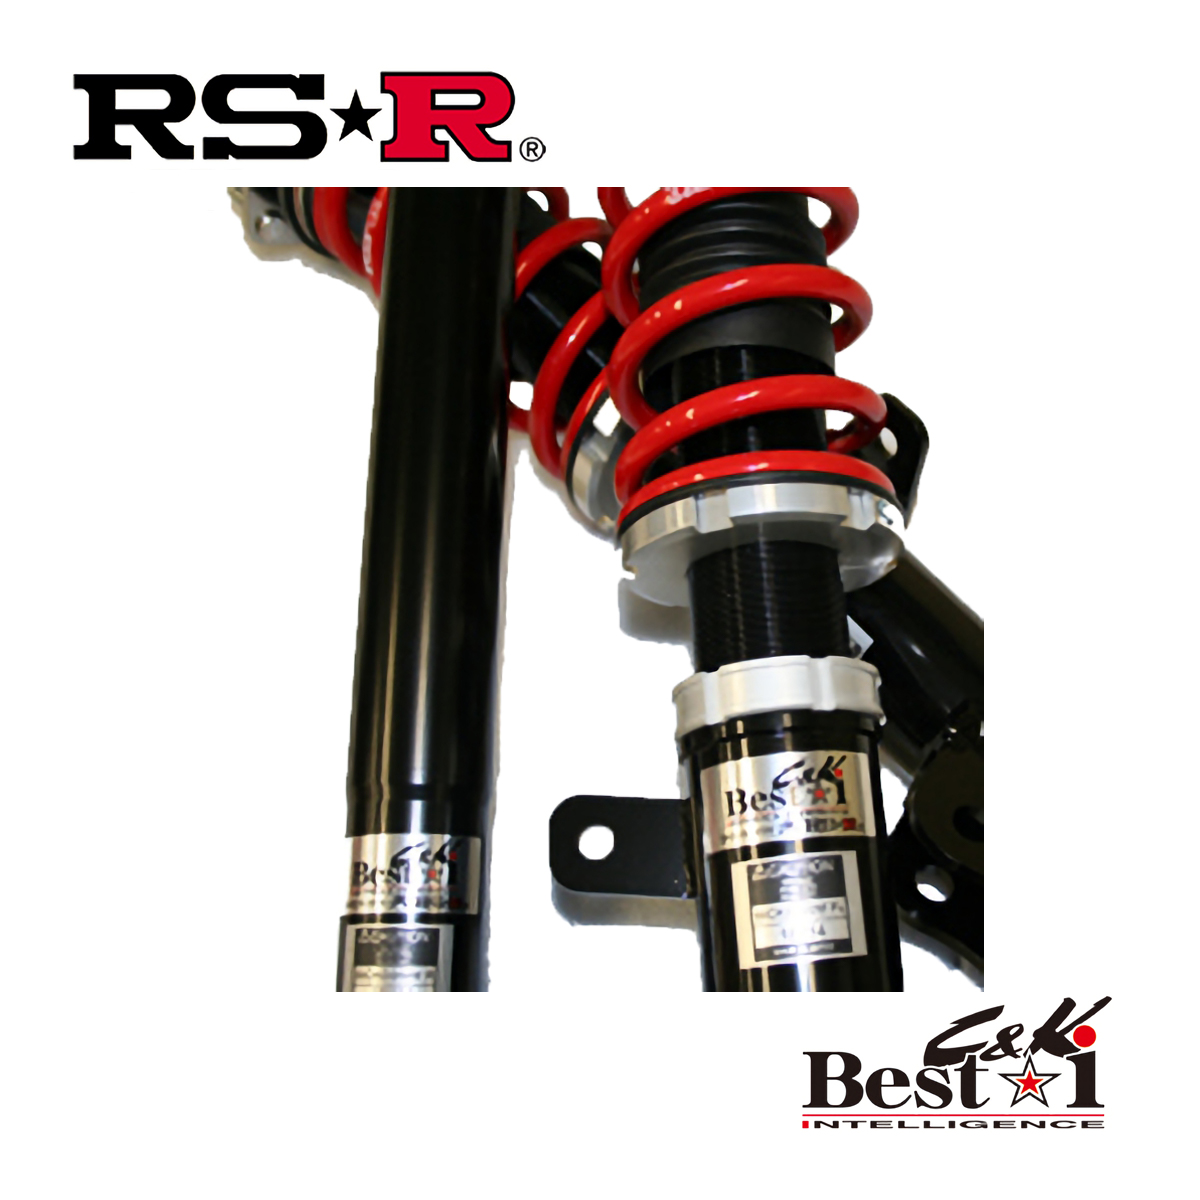 RS-R エブリィ エブリイ エブリー バン DA17V ジョインターボ 車高調 リア車高調整: ネジ式 BICKS650M ベストi C&K RSR 個人宅発送追金有